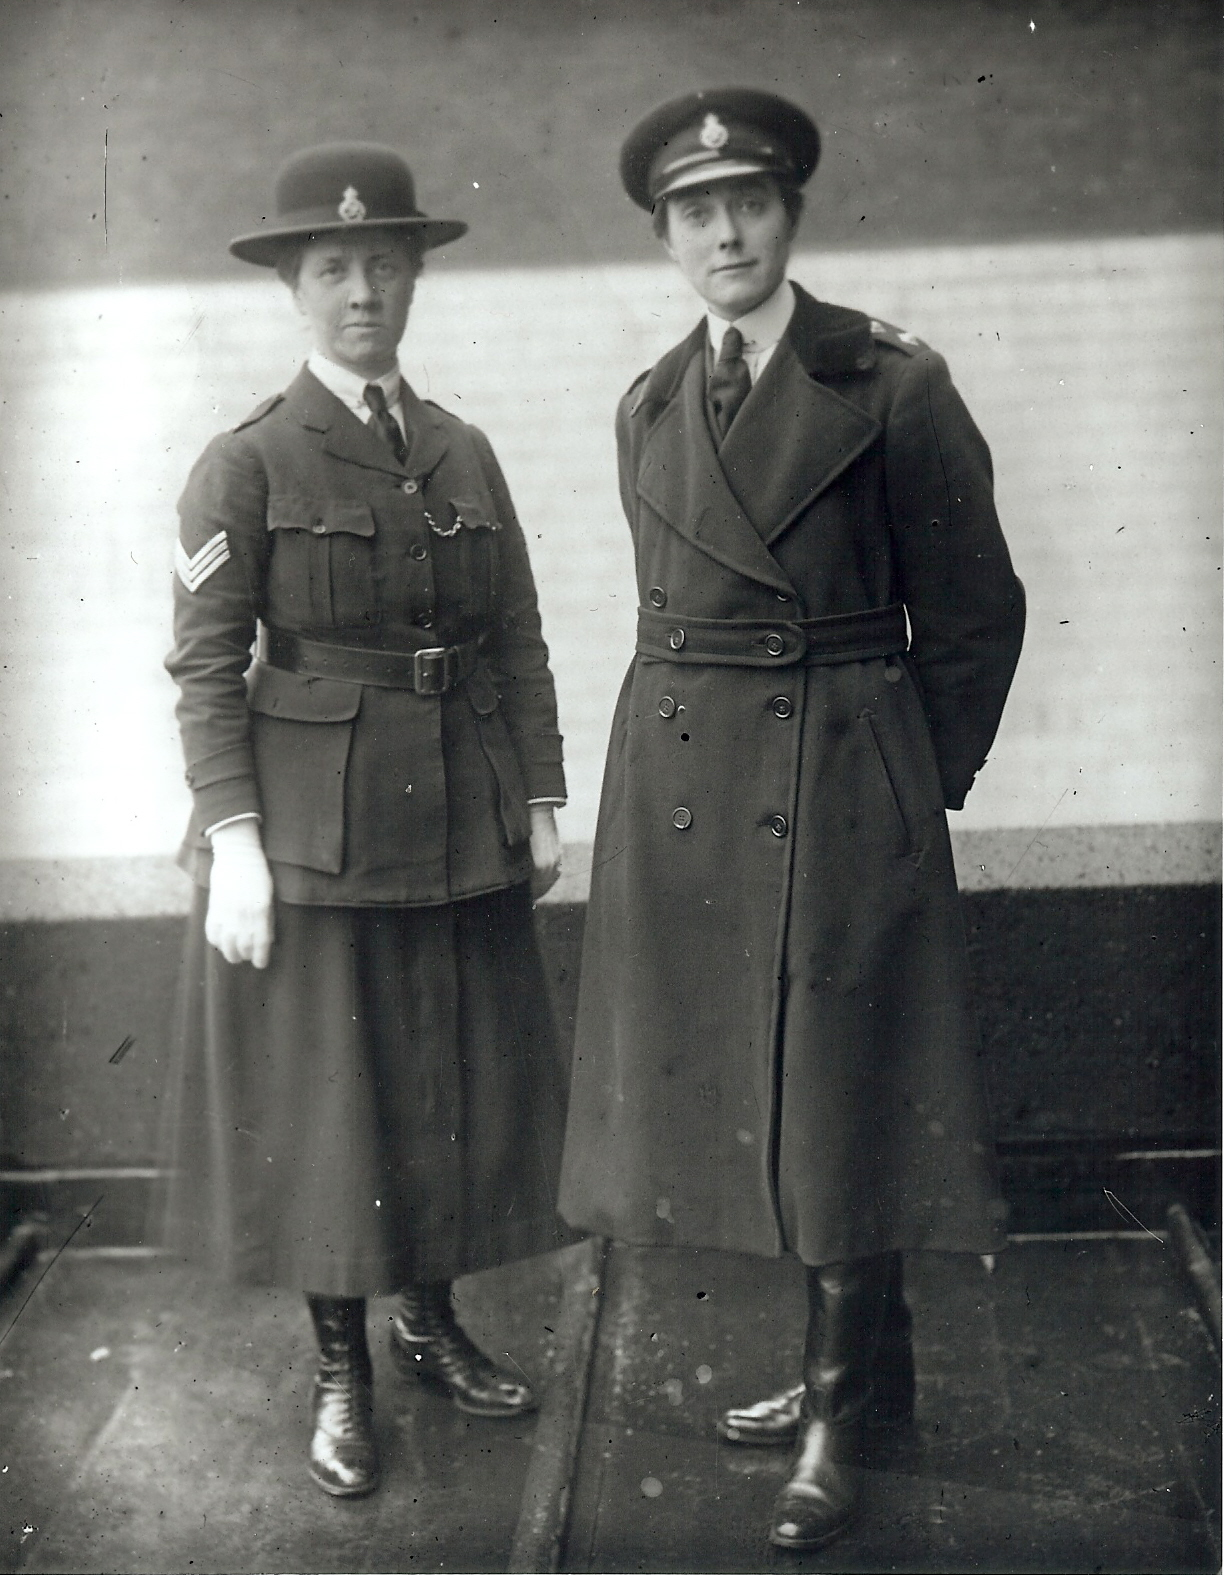 Women's Police